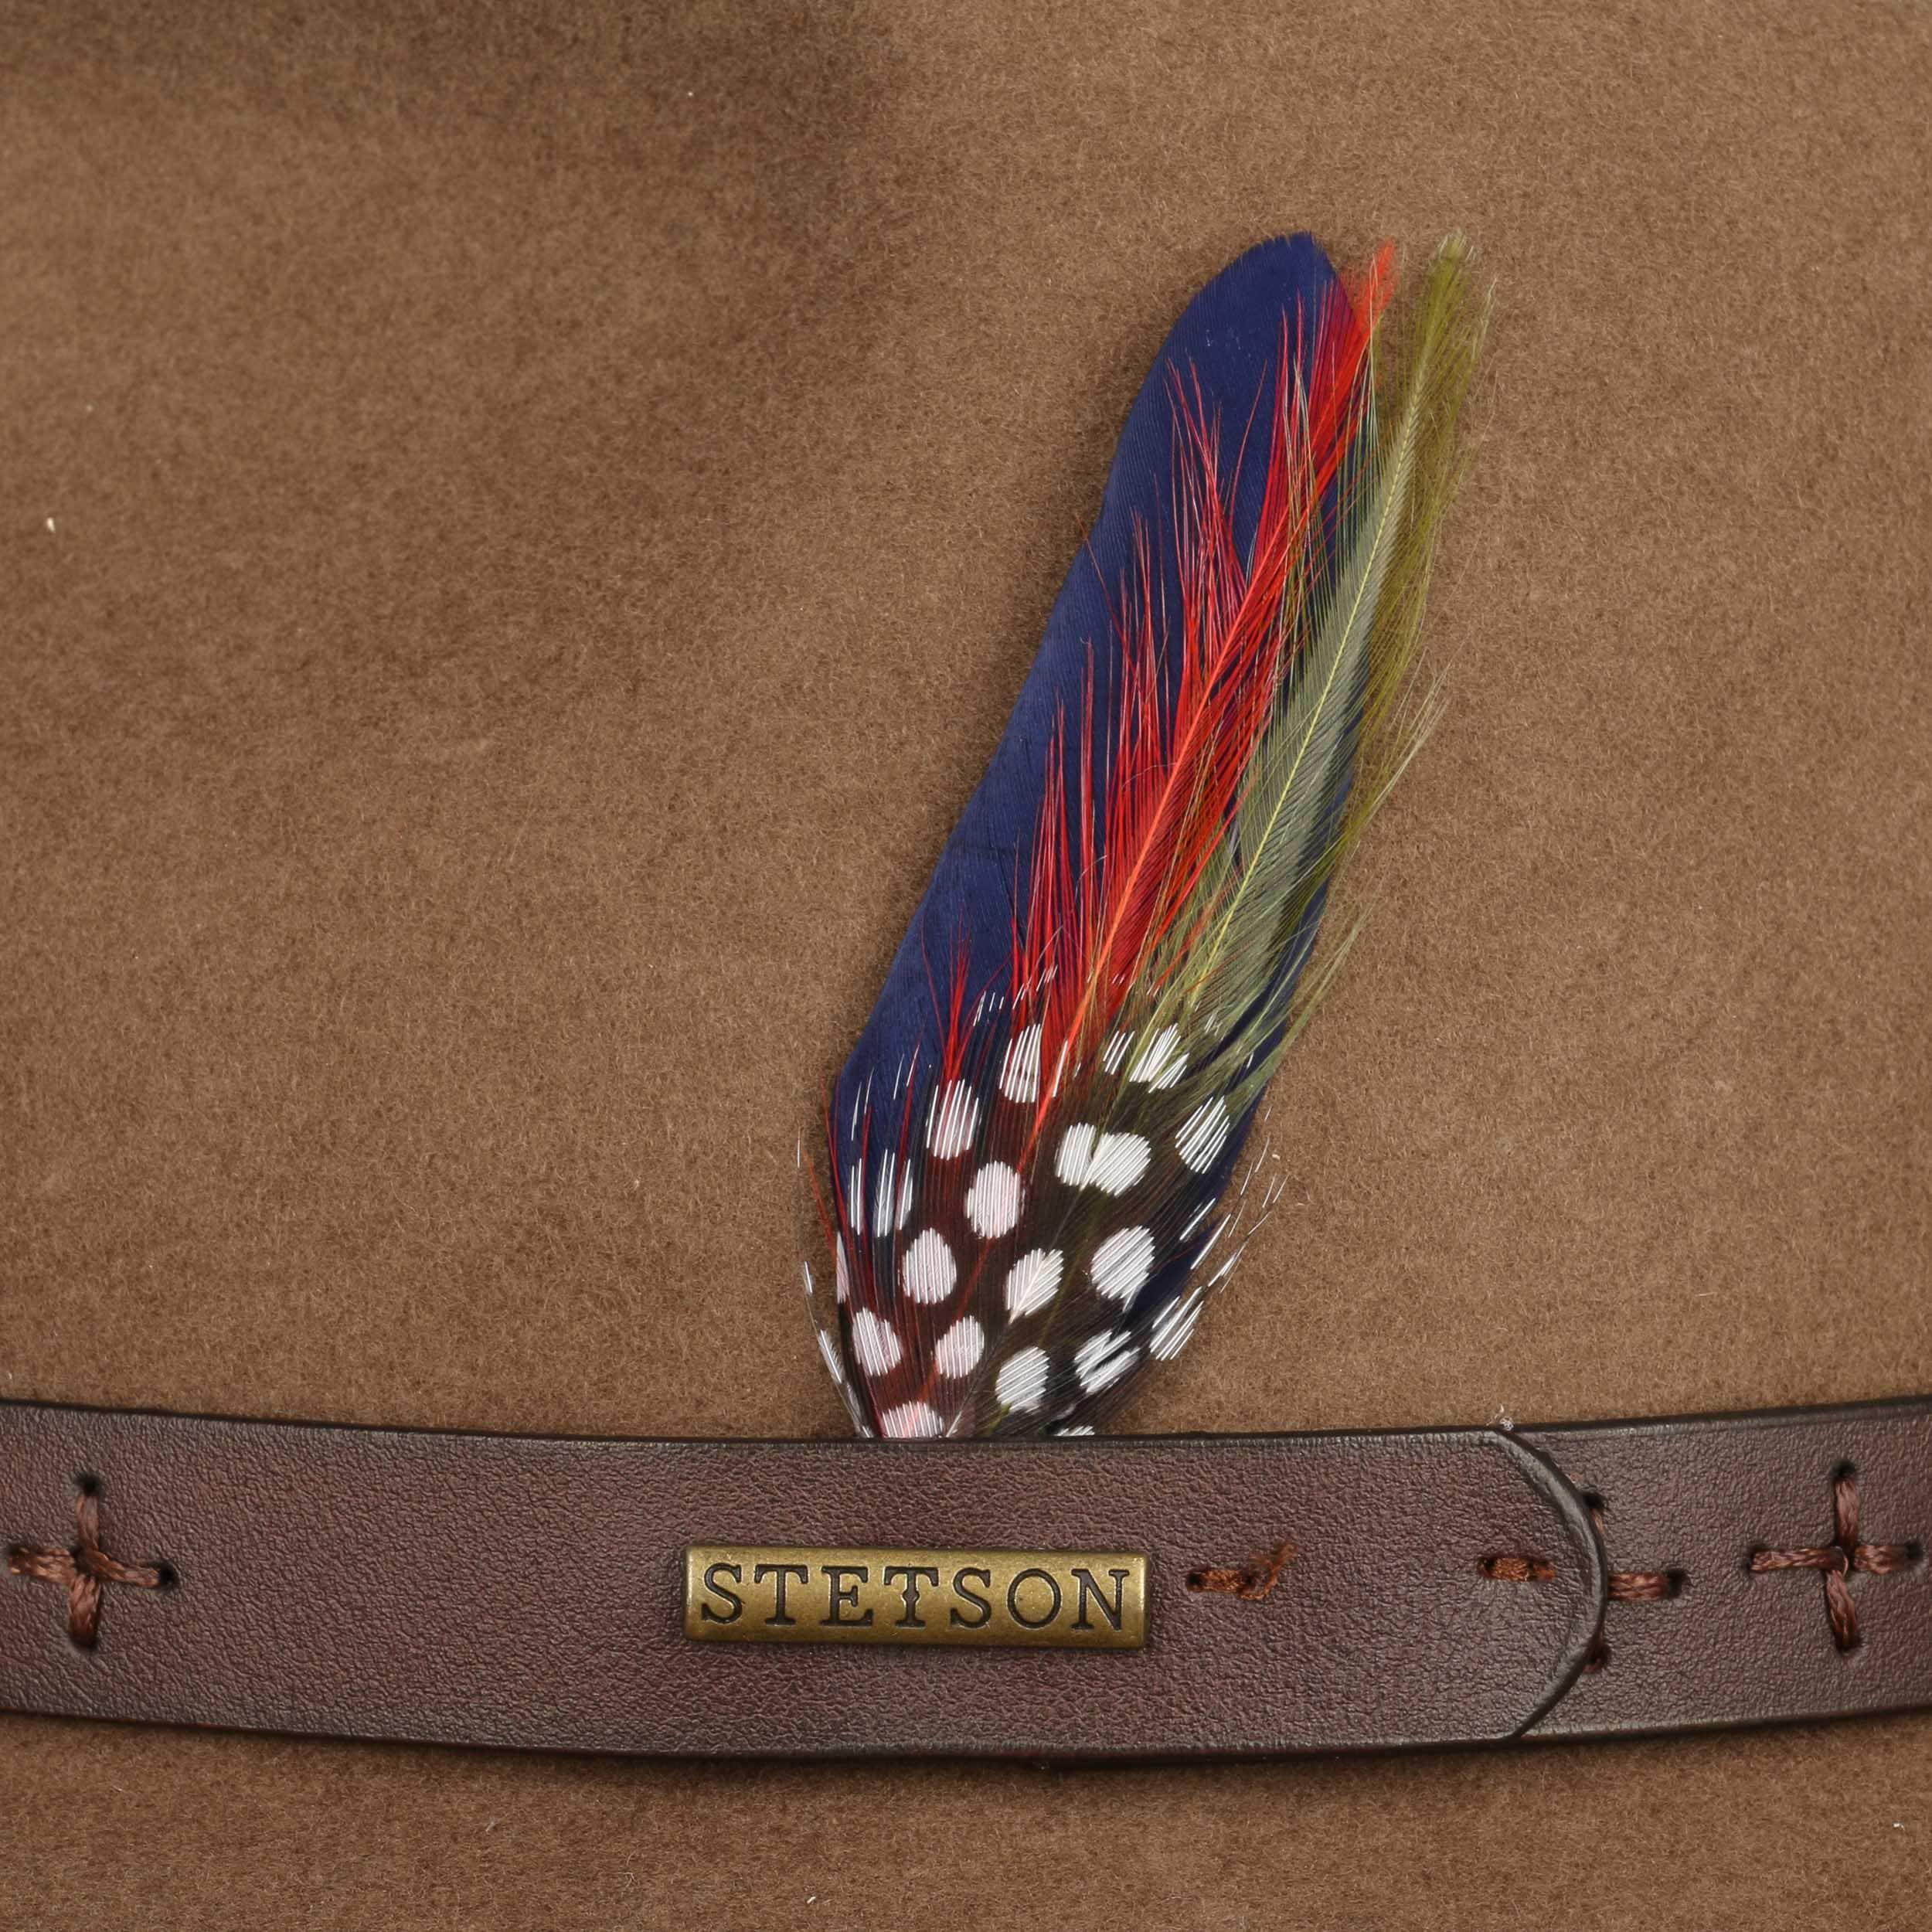 ... Powland Cowboy Cappello by Stetson - marrone 3 ... 91421de75bc4